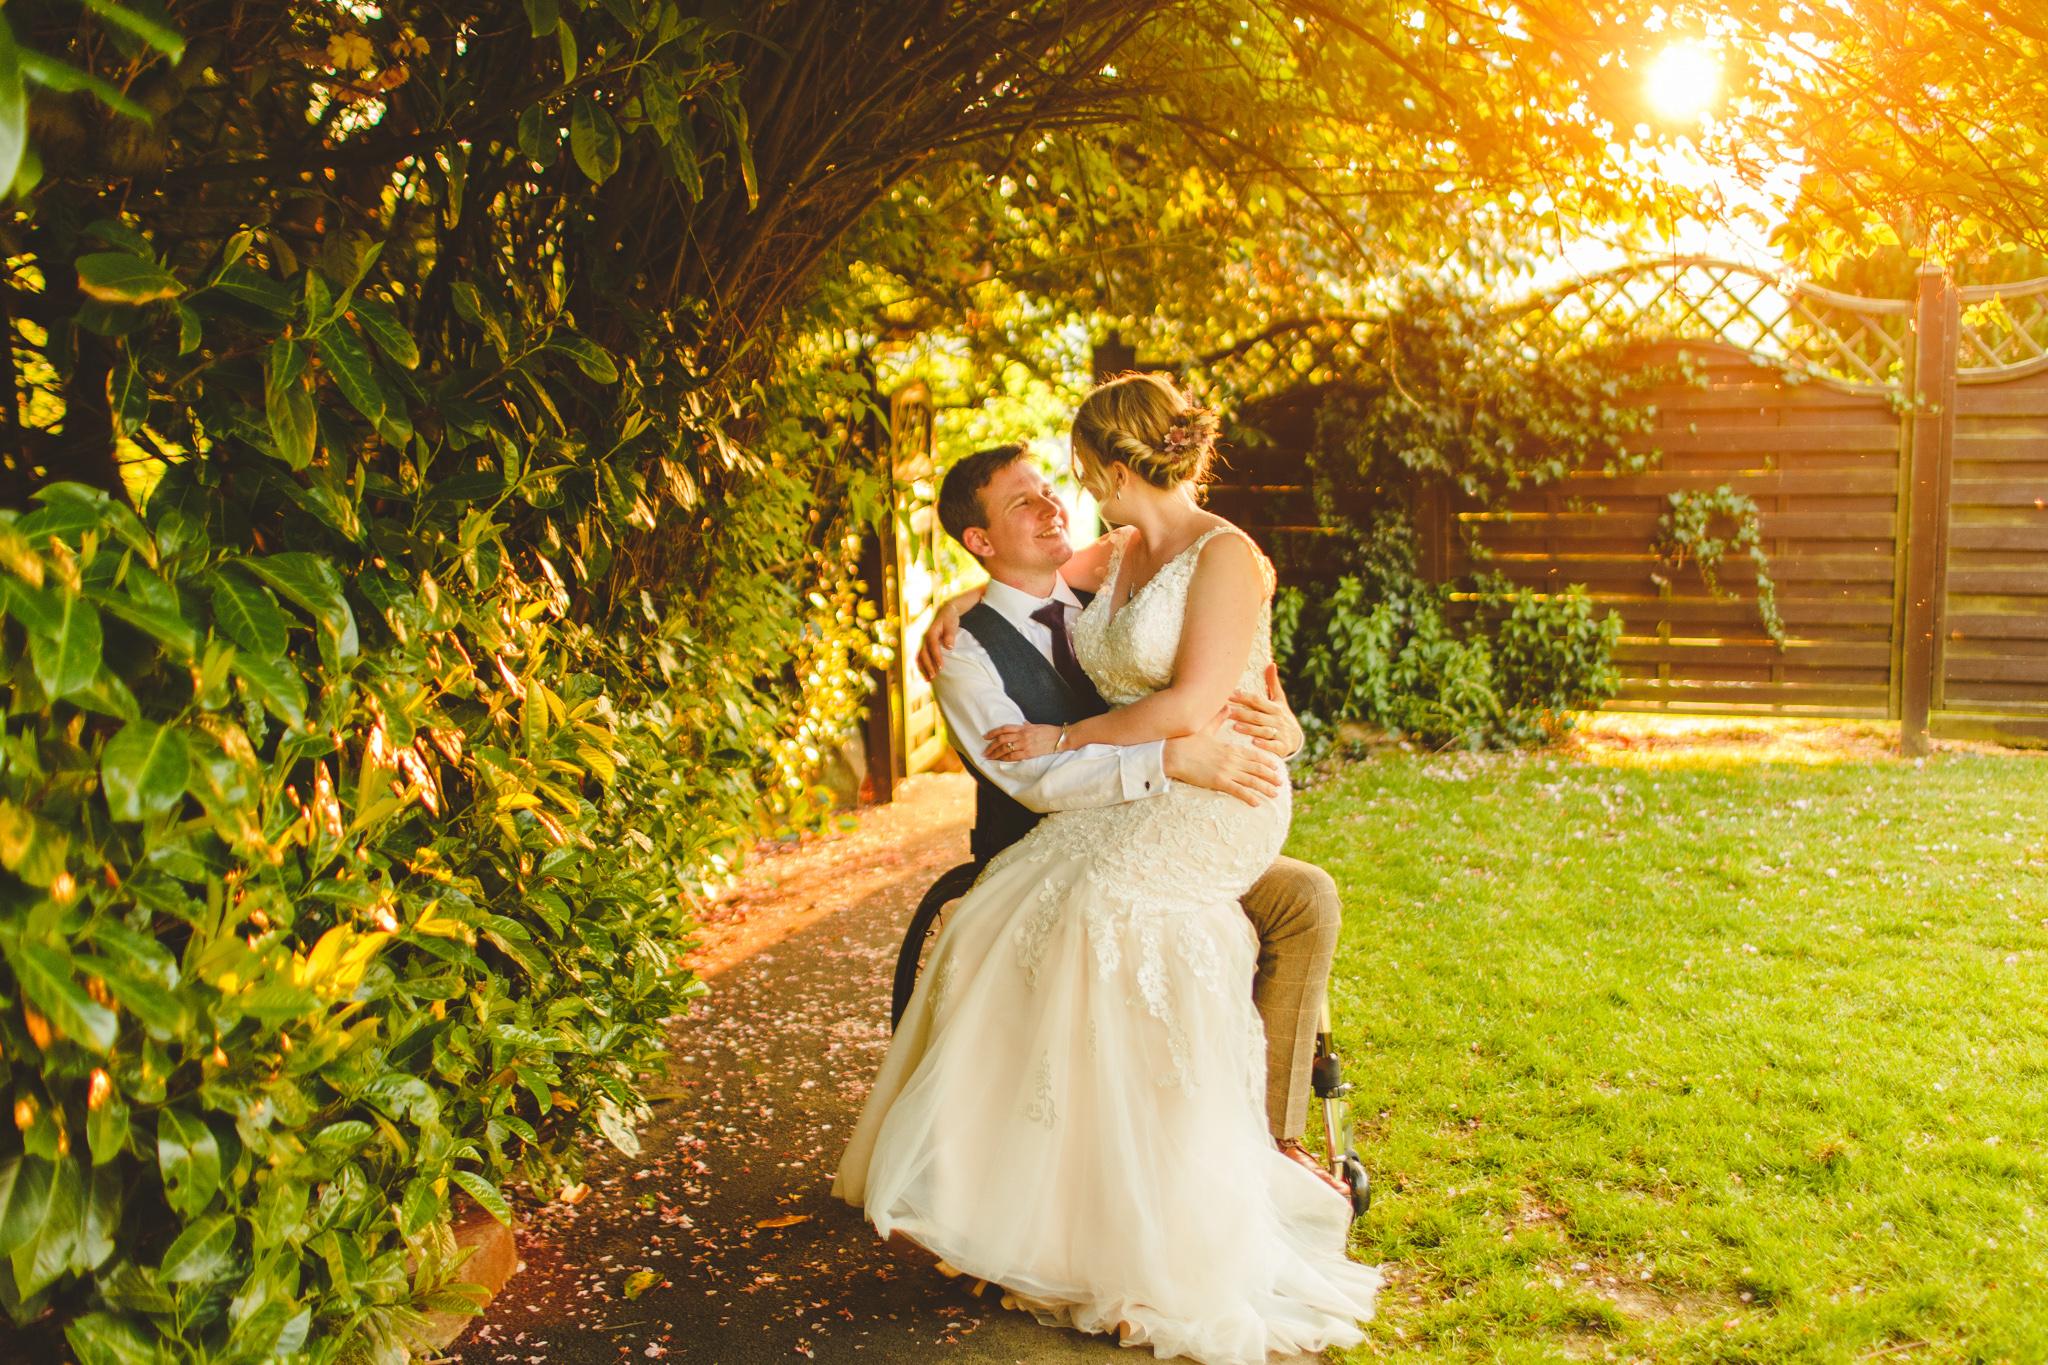 derbyshire-wedding-photographer-videographer-camera-hannah-59.jpg